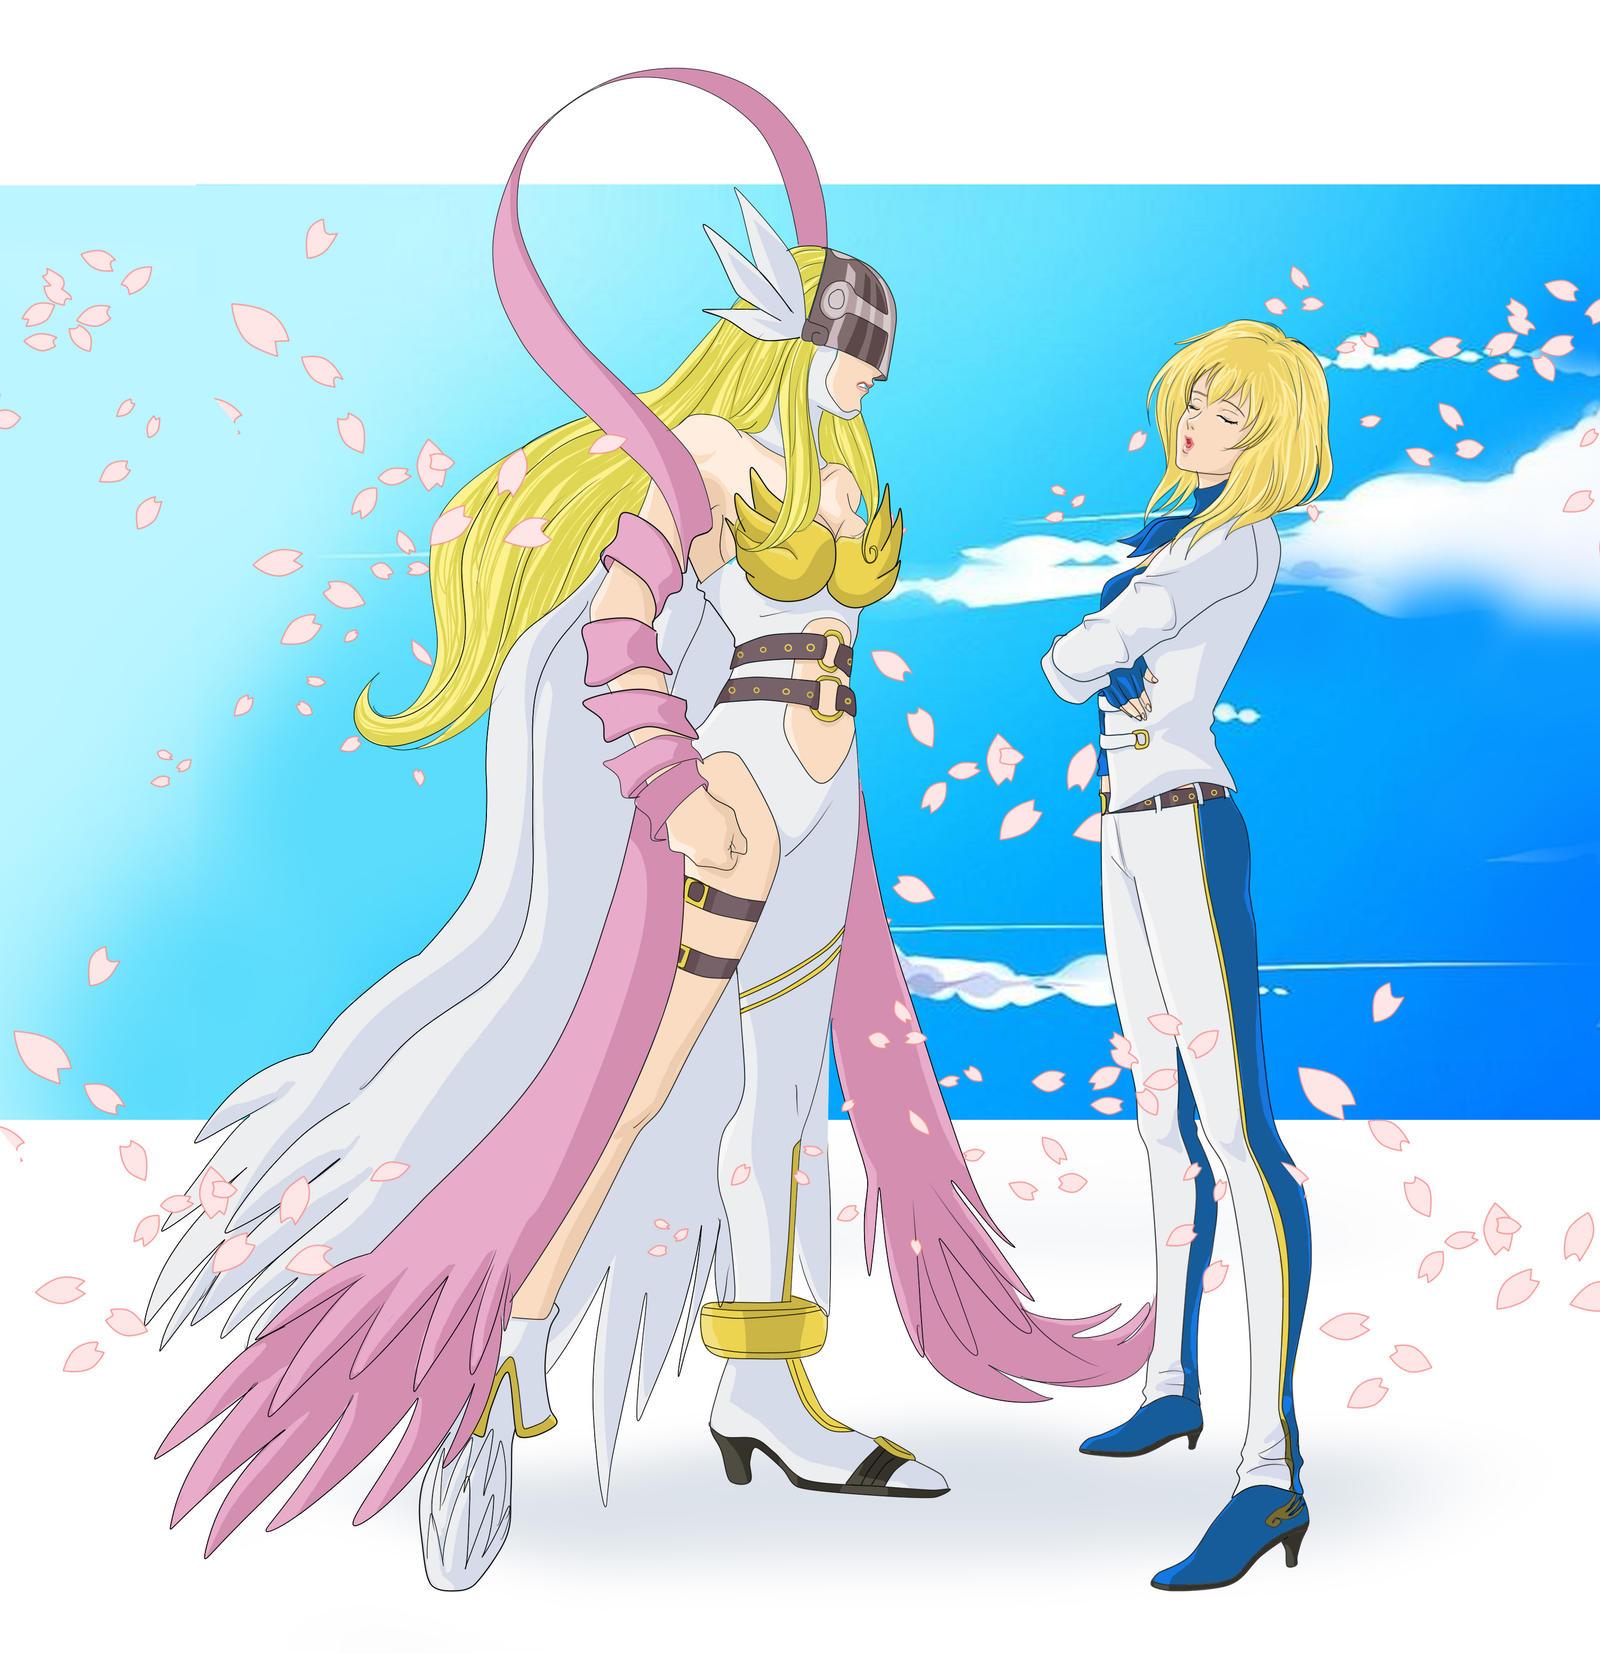 Angewomon meets her human self – Digimon Infinity